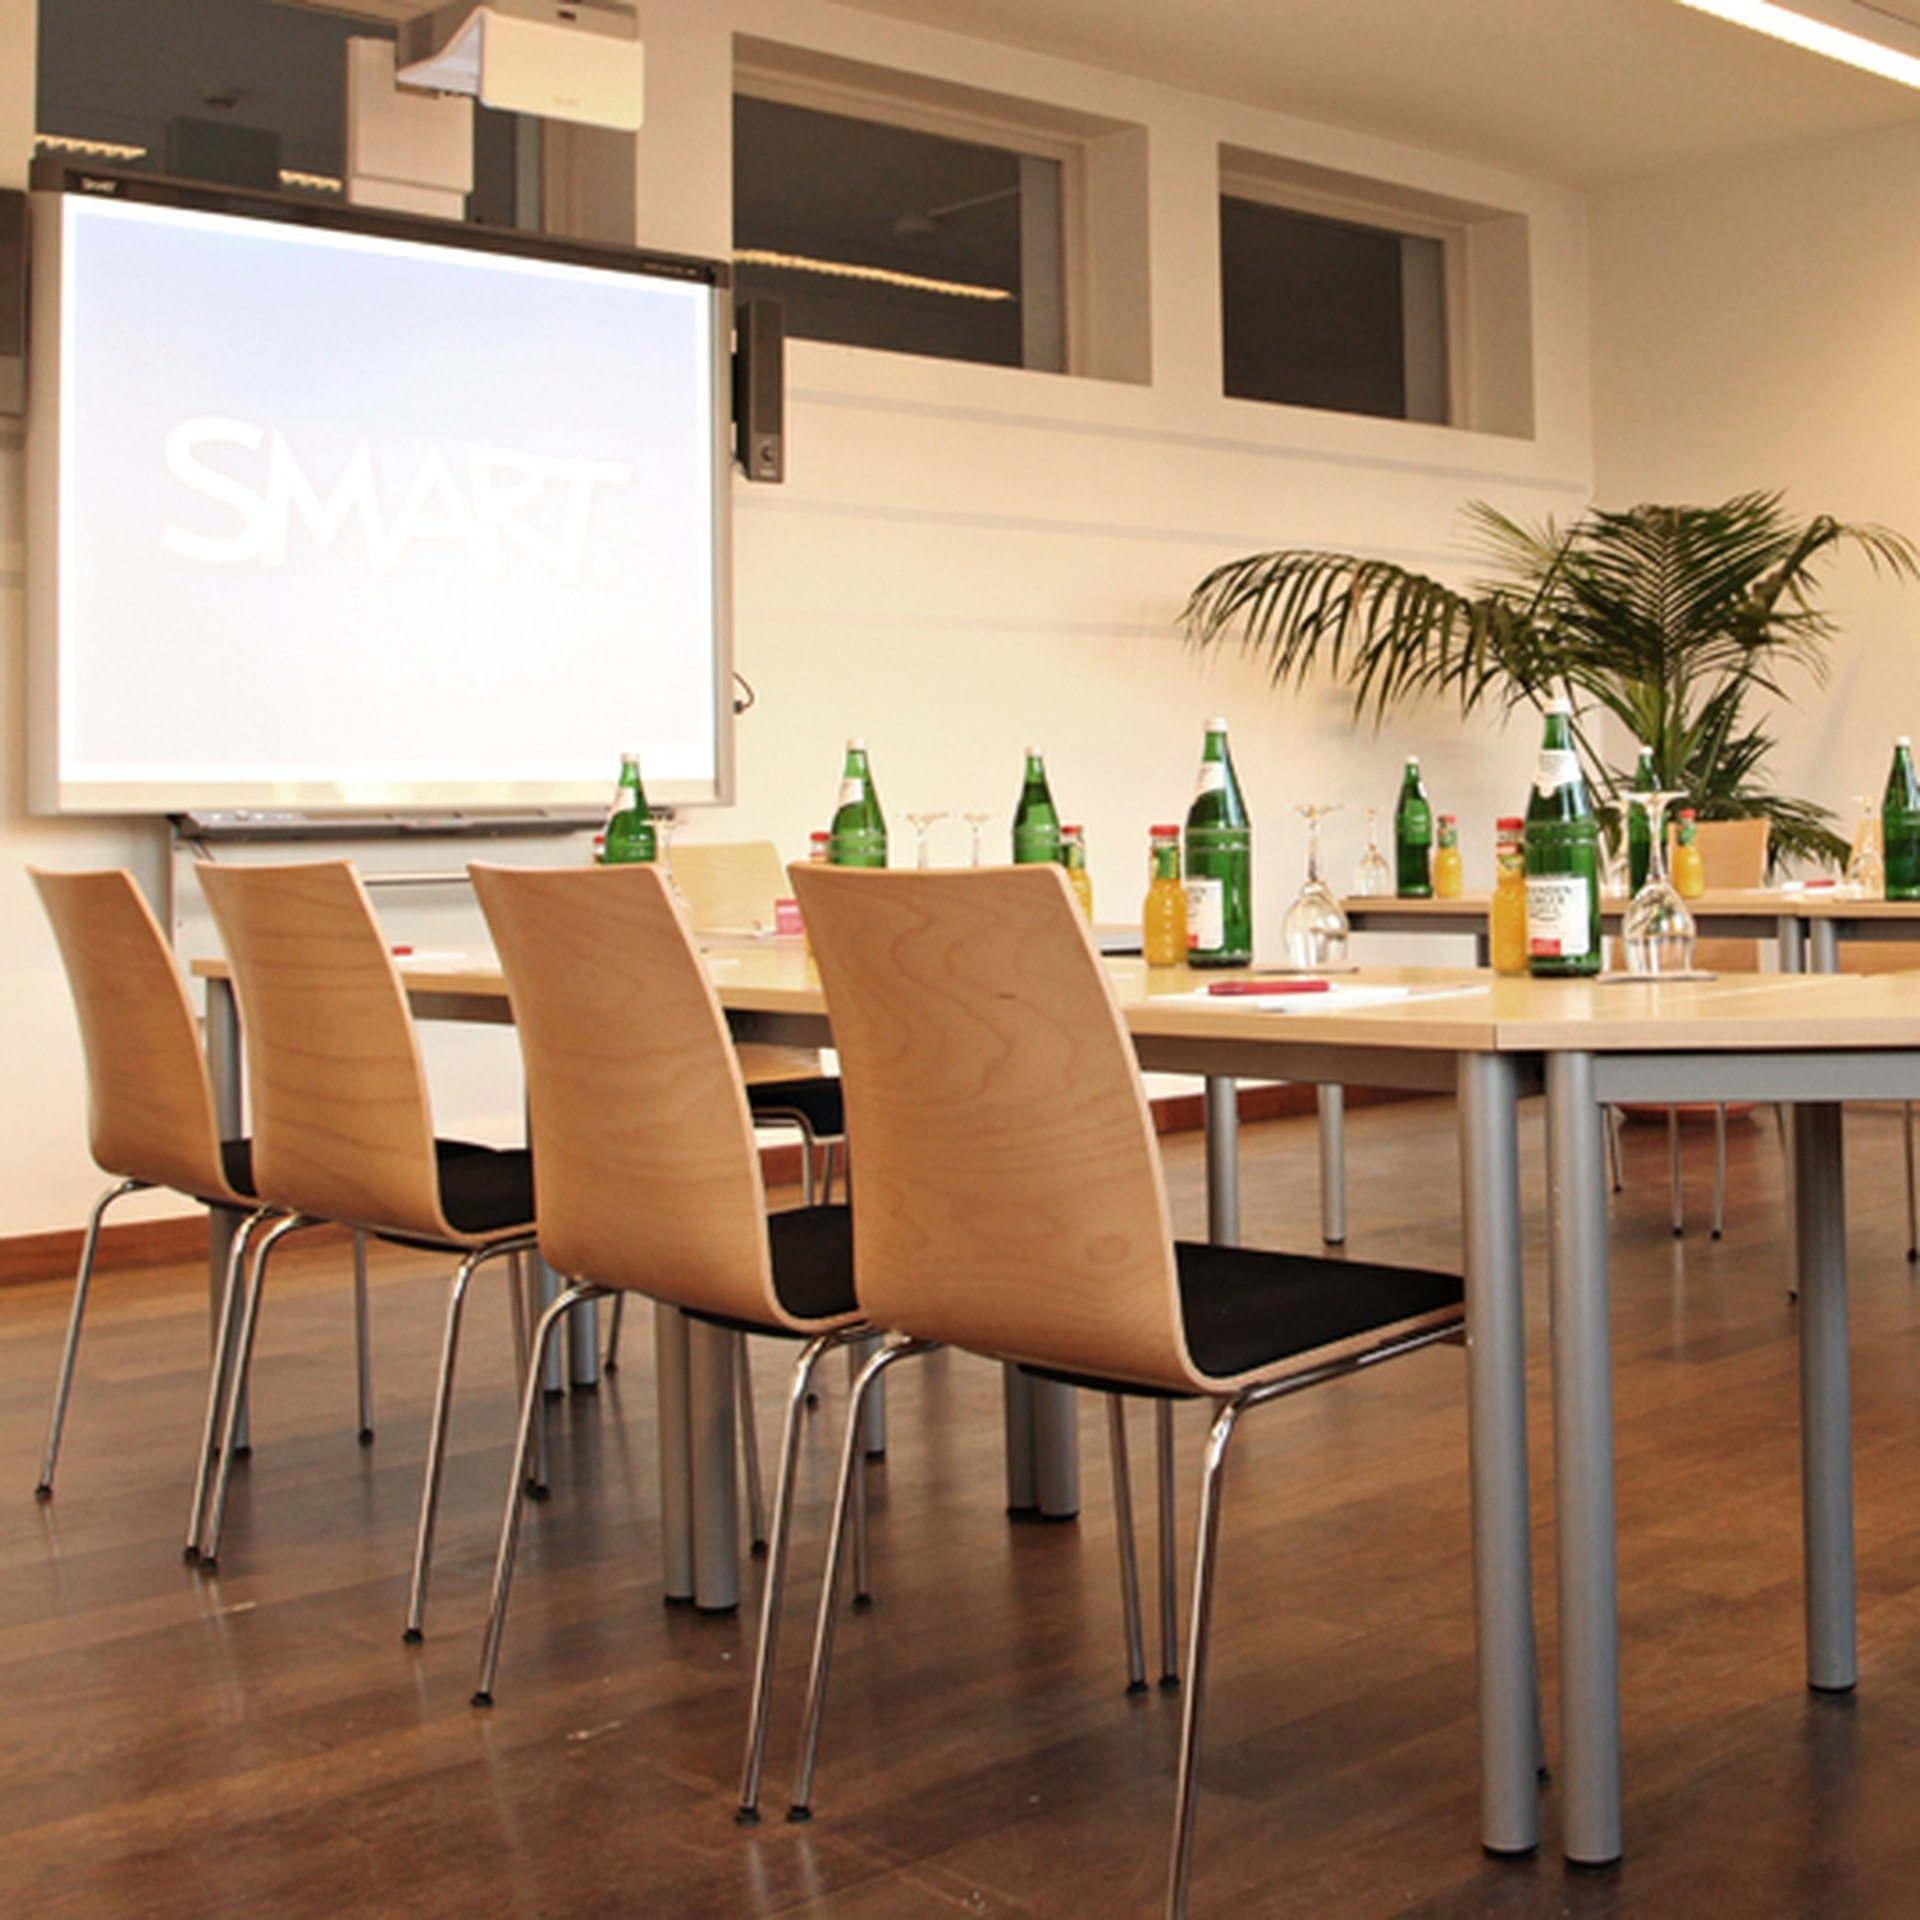 Berlin training rooms Meeting room GLS - Seminar Room 2 image 0